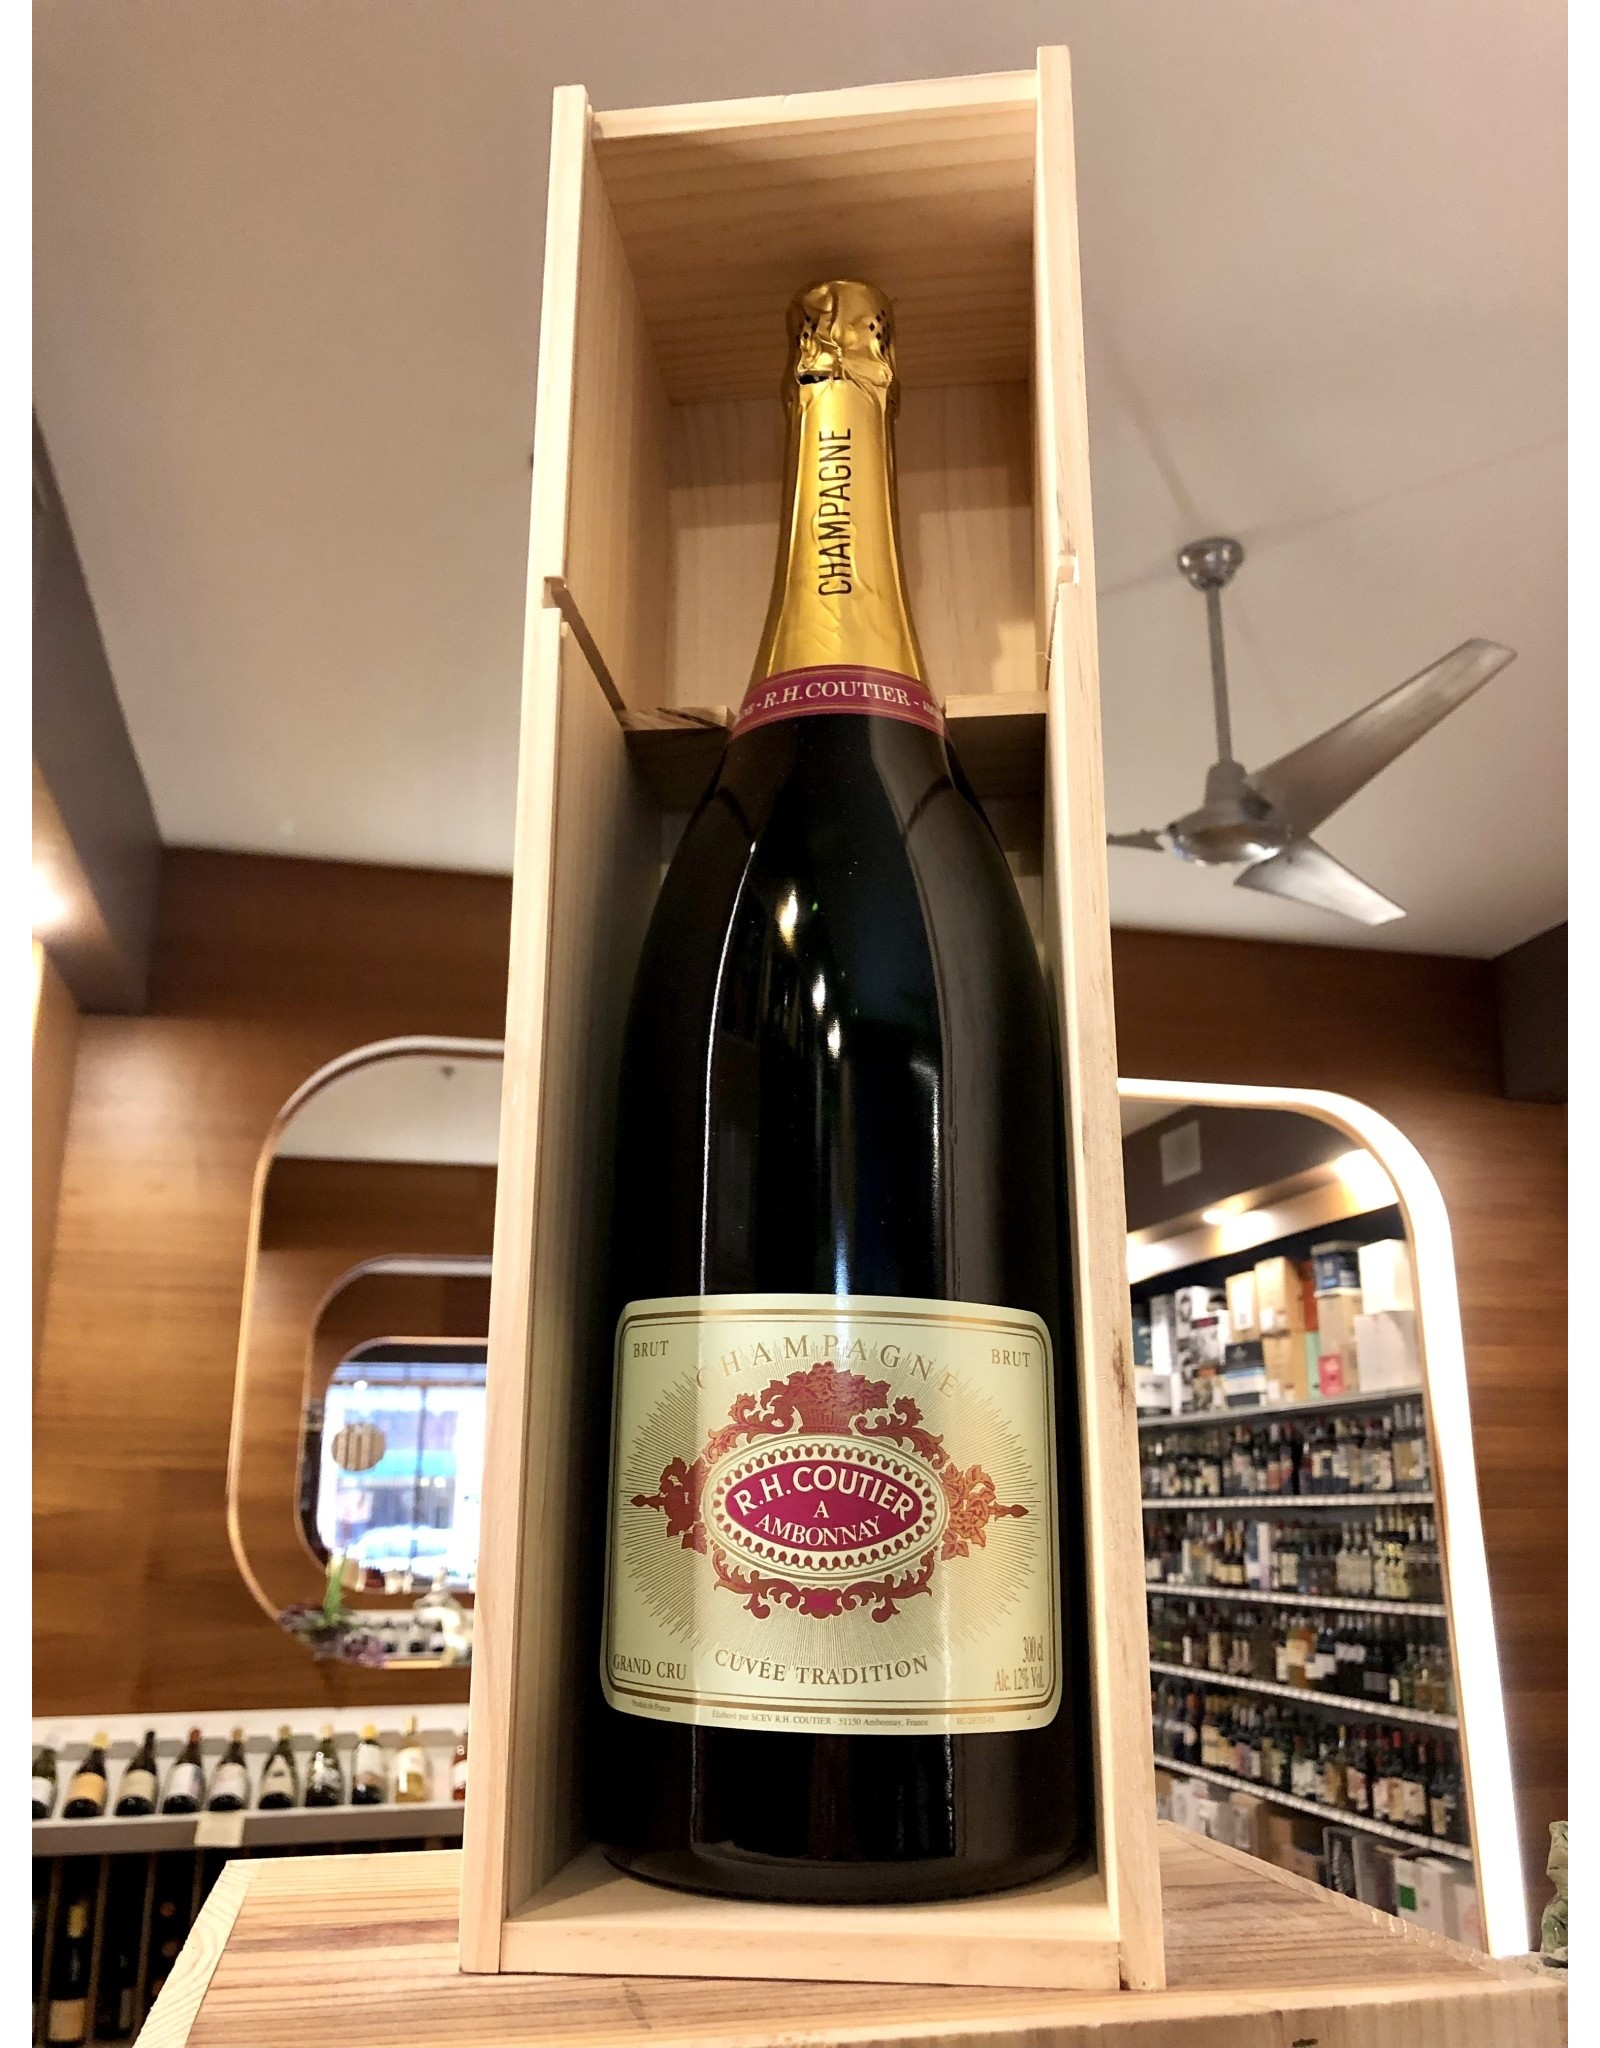 RH Coutier Grand Cru Brut Tradition Champagne JEROBOAM - 3 Liter